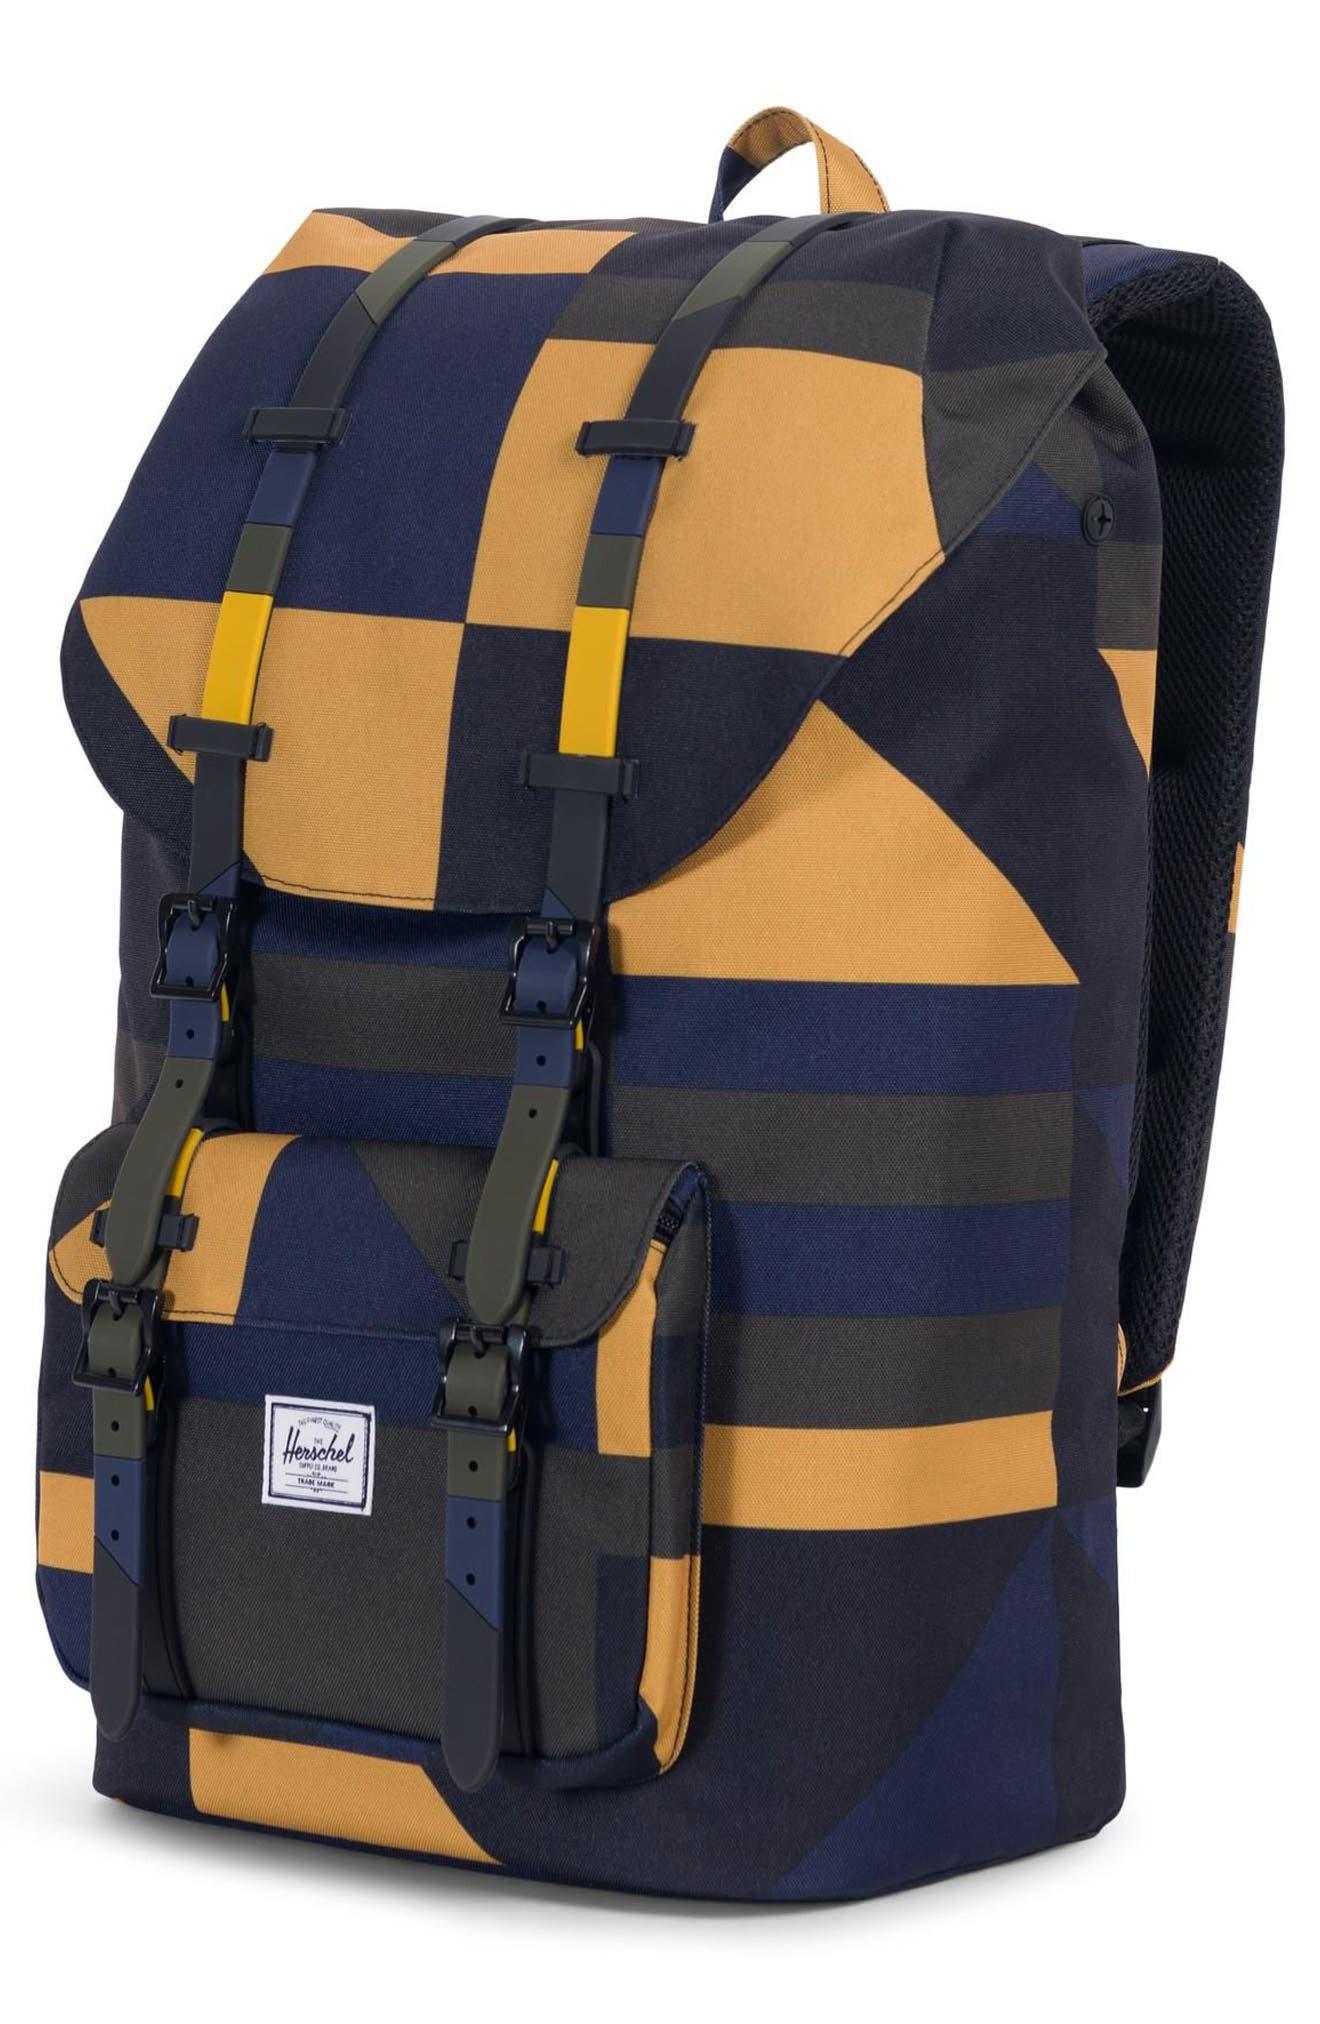 Little America Backpack,                             Alternate thumbnail 4, color,                             ARROW WOOD FRONTIER GEO